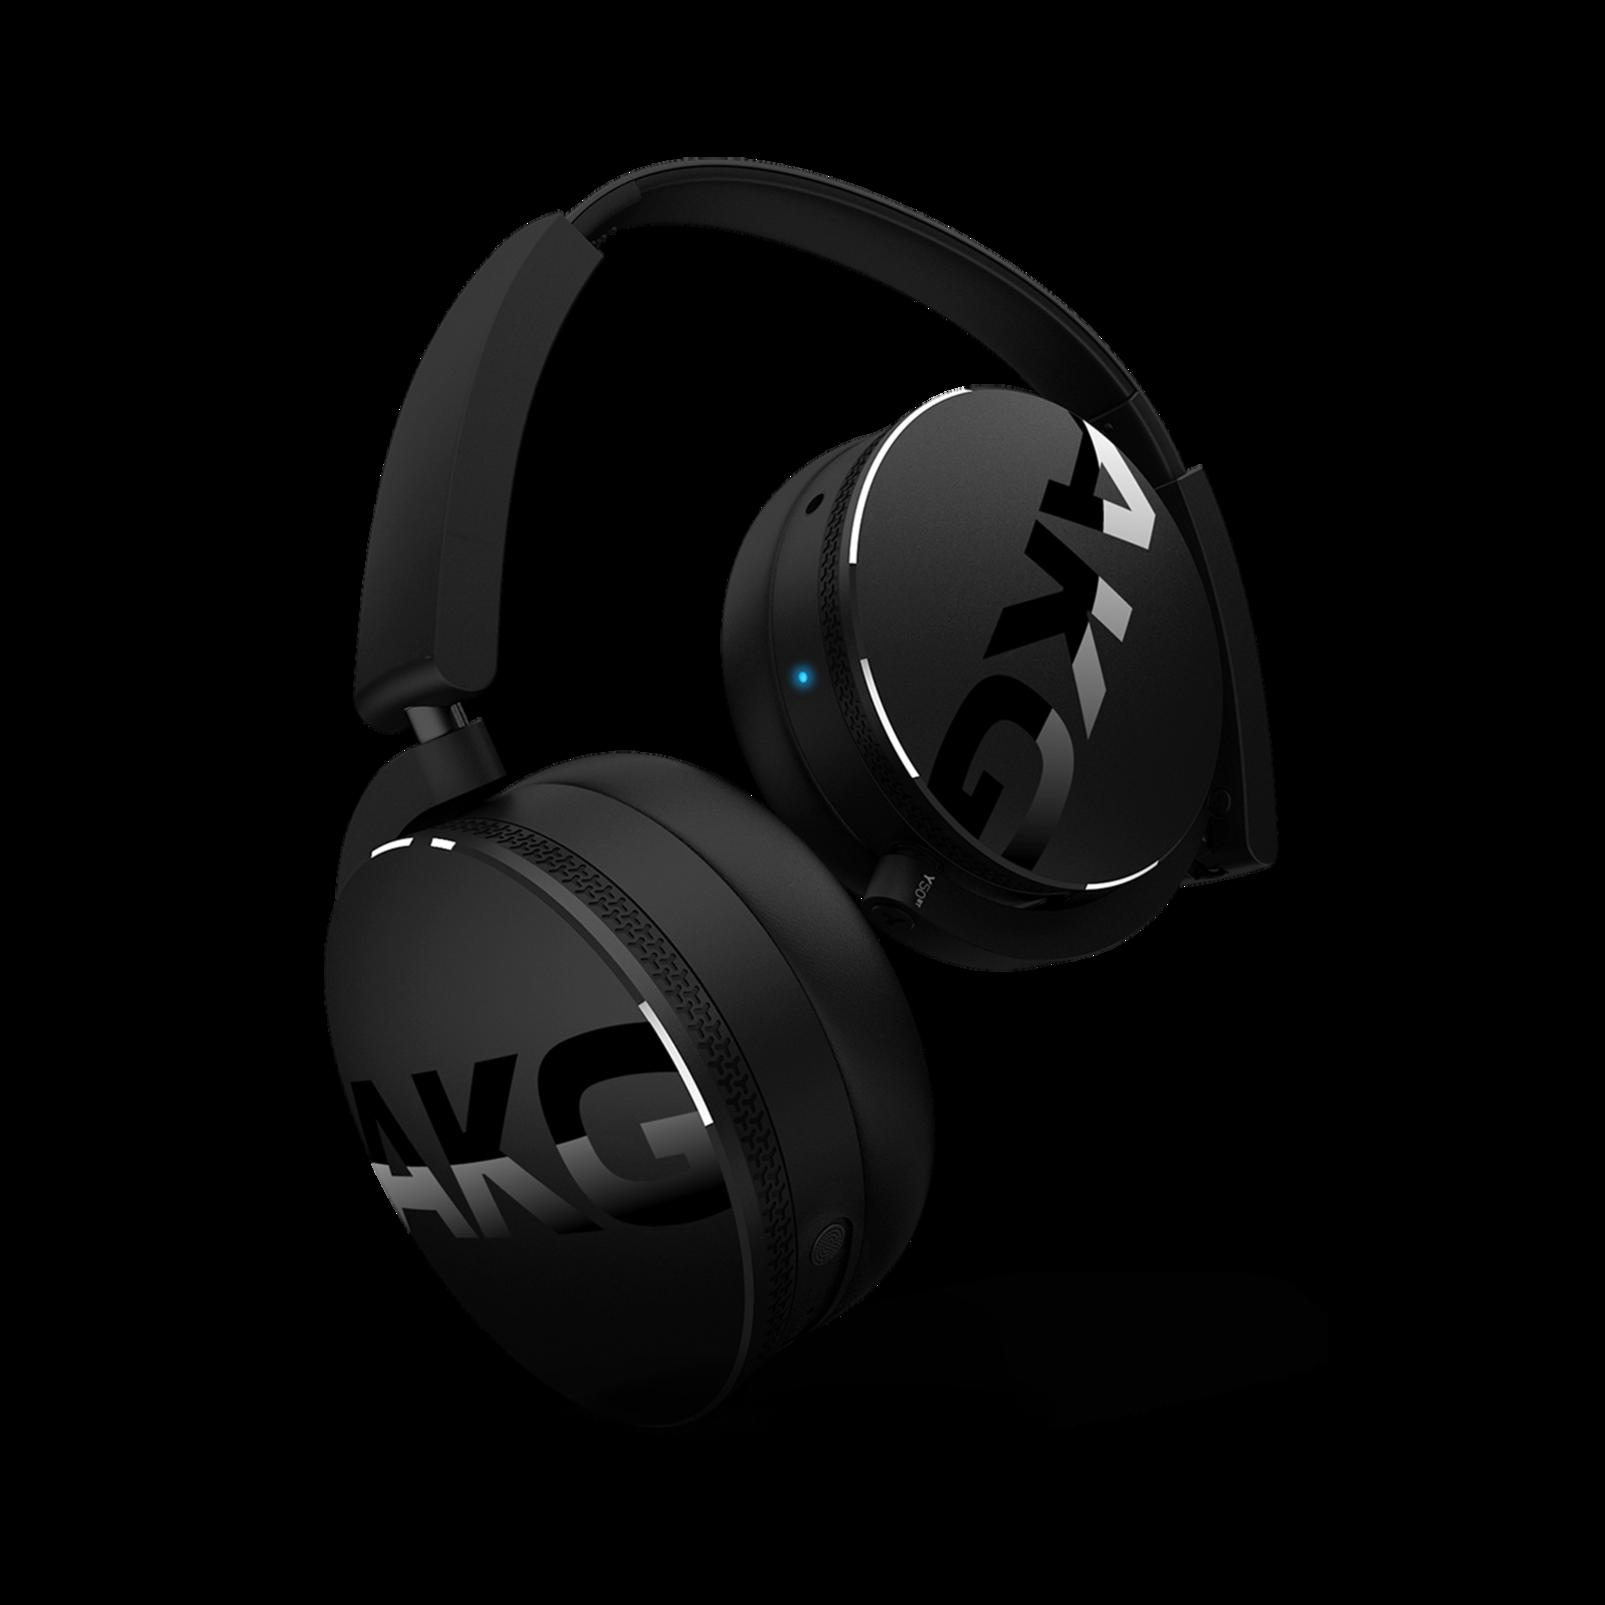 Y50BT - Black - Premium portable Bluetooth speaker with quad microphone conferencing system - Detailshot 3